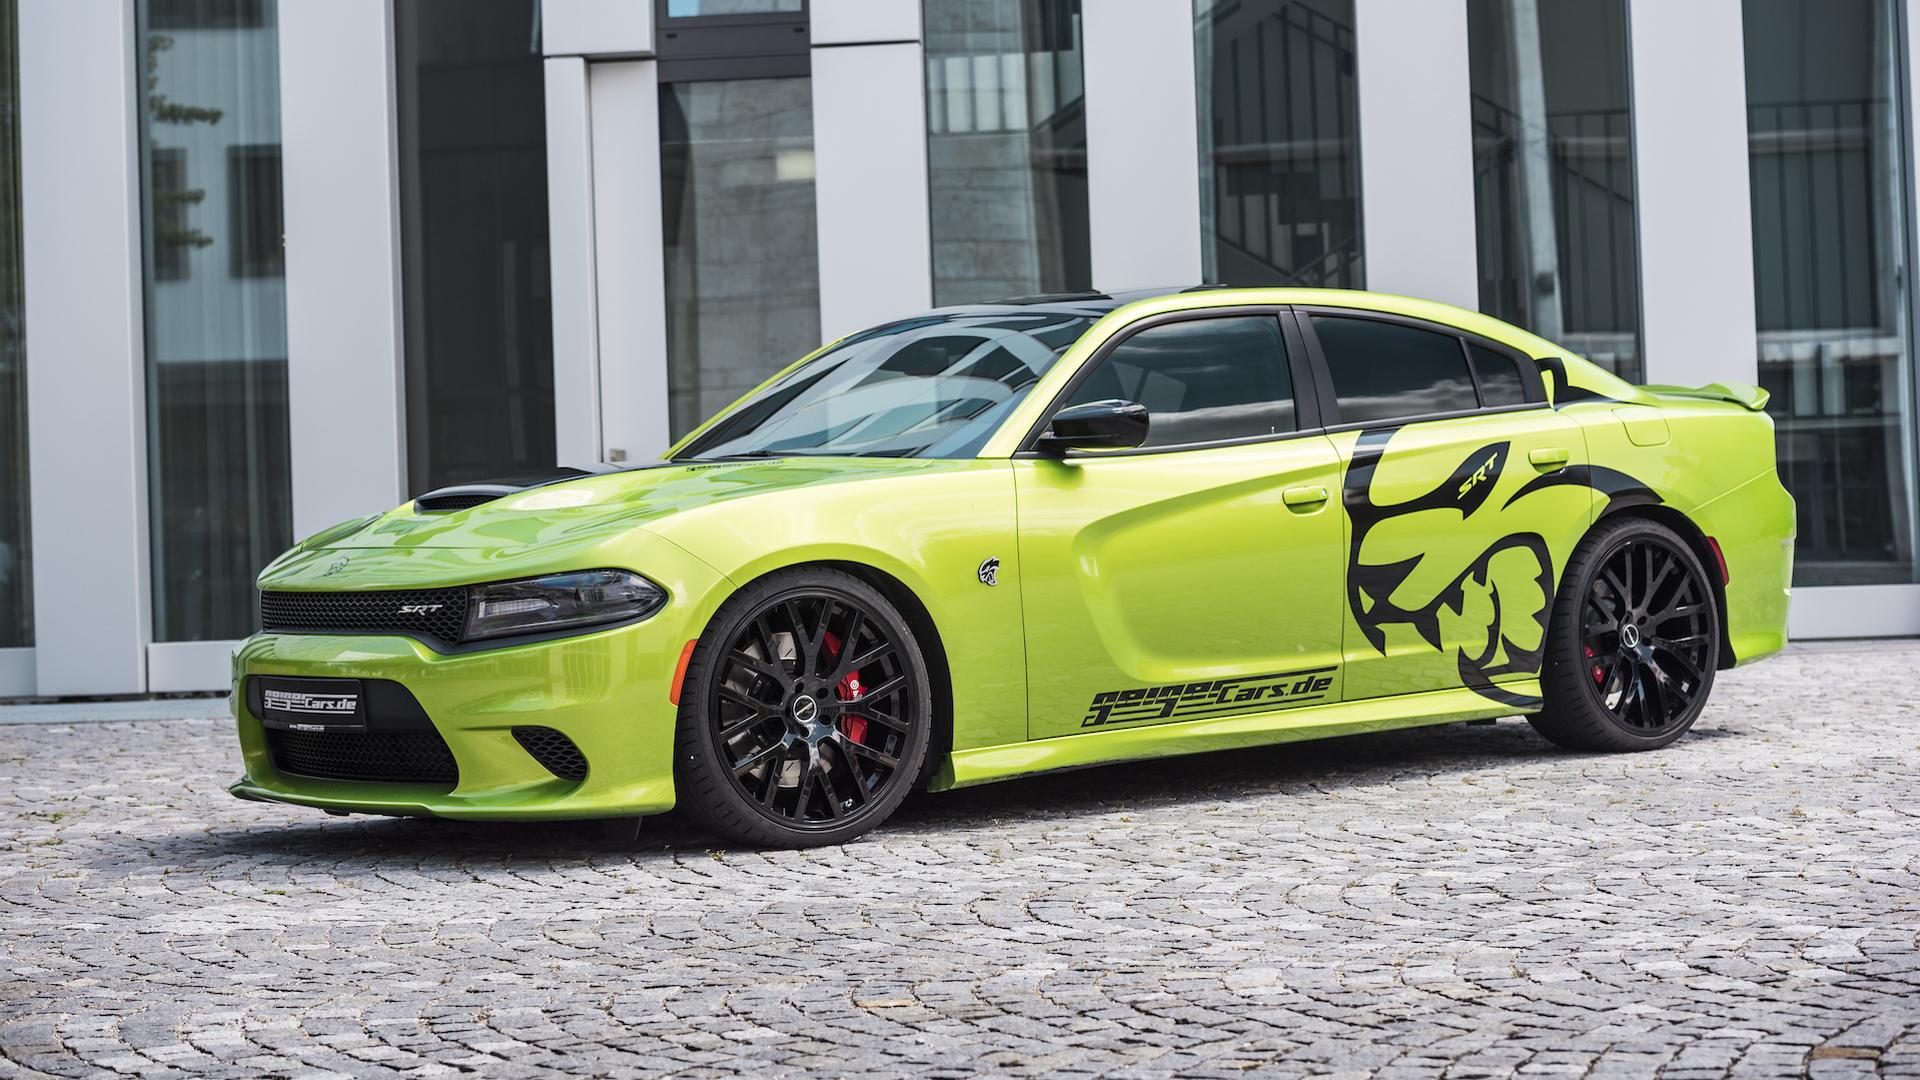 Charger Srt Hellcat >> German Tuned Dodge Charger Srt Hellcat Unleashes 782 Horsepower